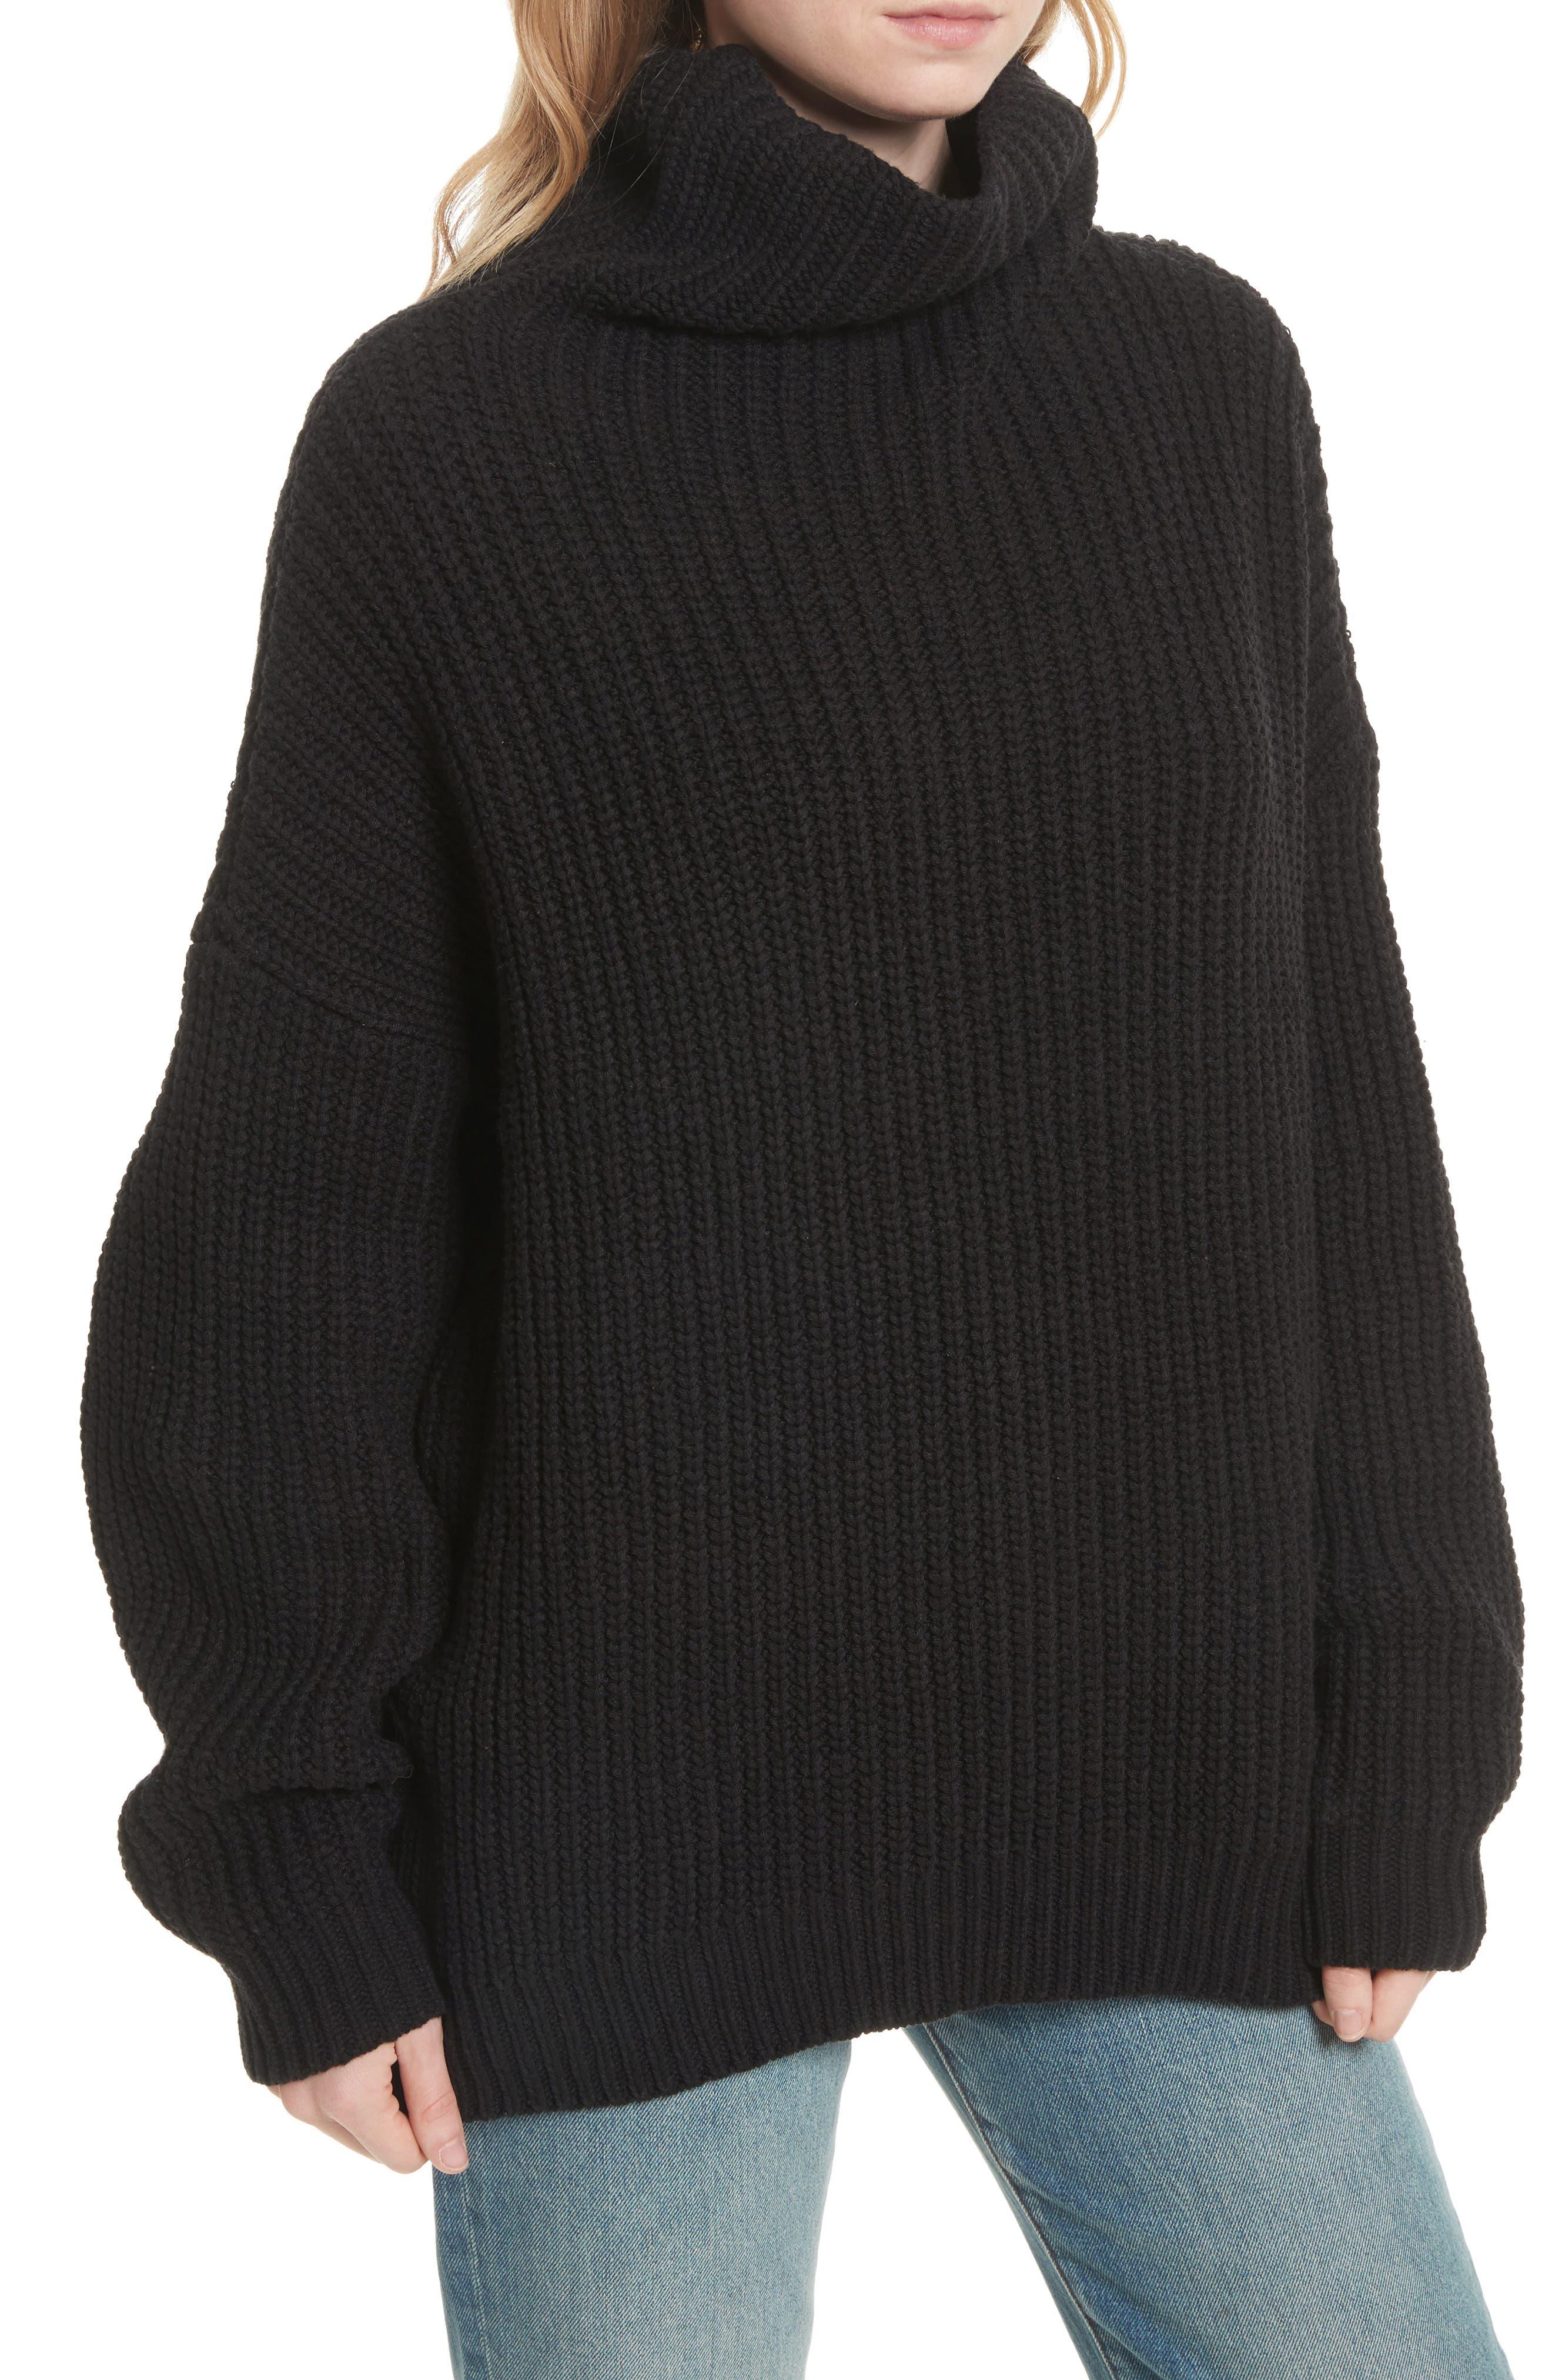 Swim Too Deep Turtleneck Sweater,                             Alternate thumbnail 4, color,                             001